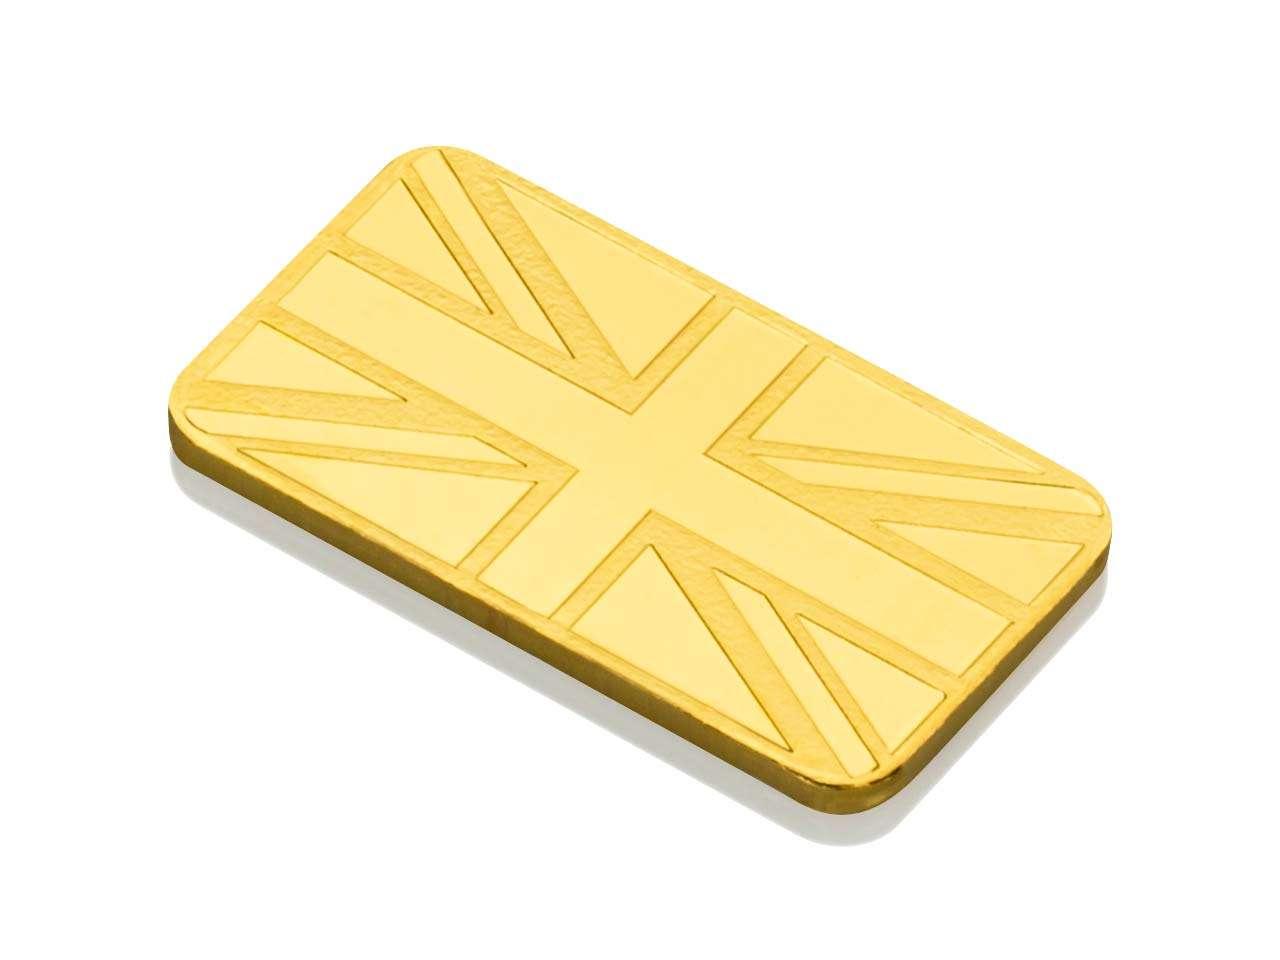 10 GRAM FINE GOLD BAR